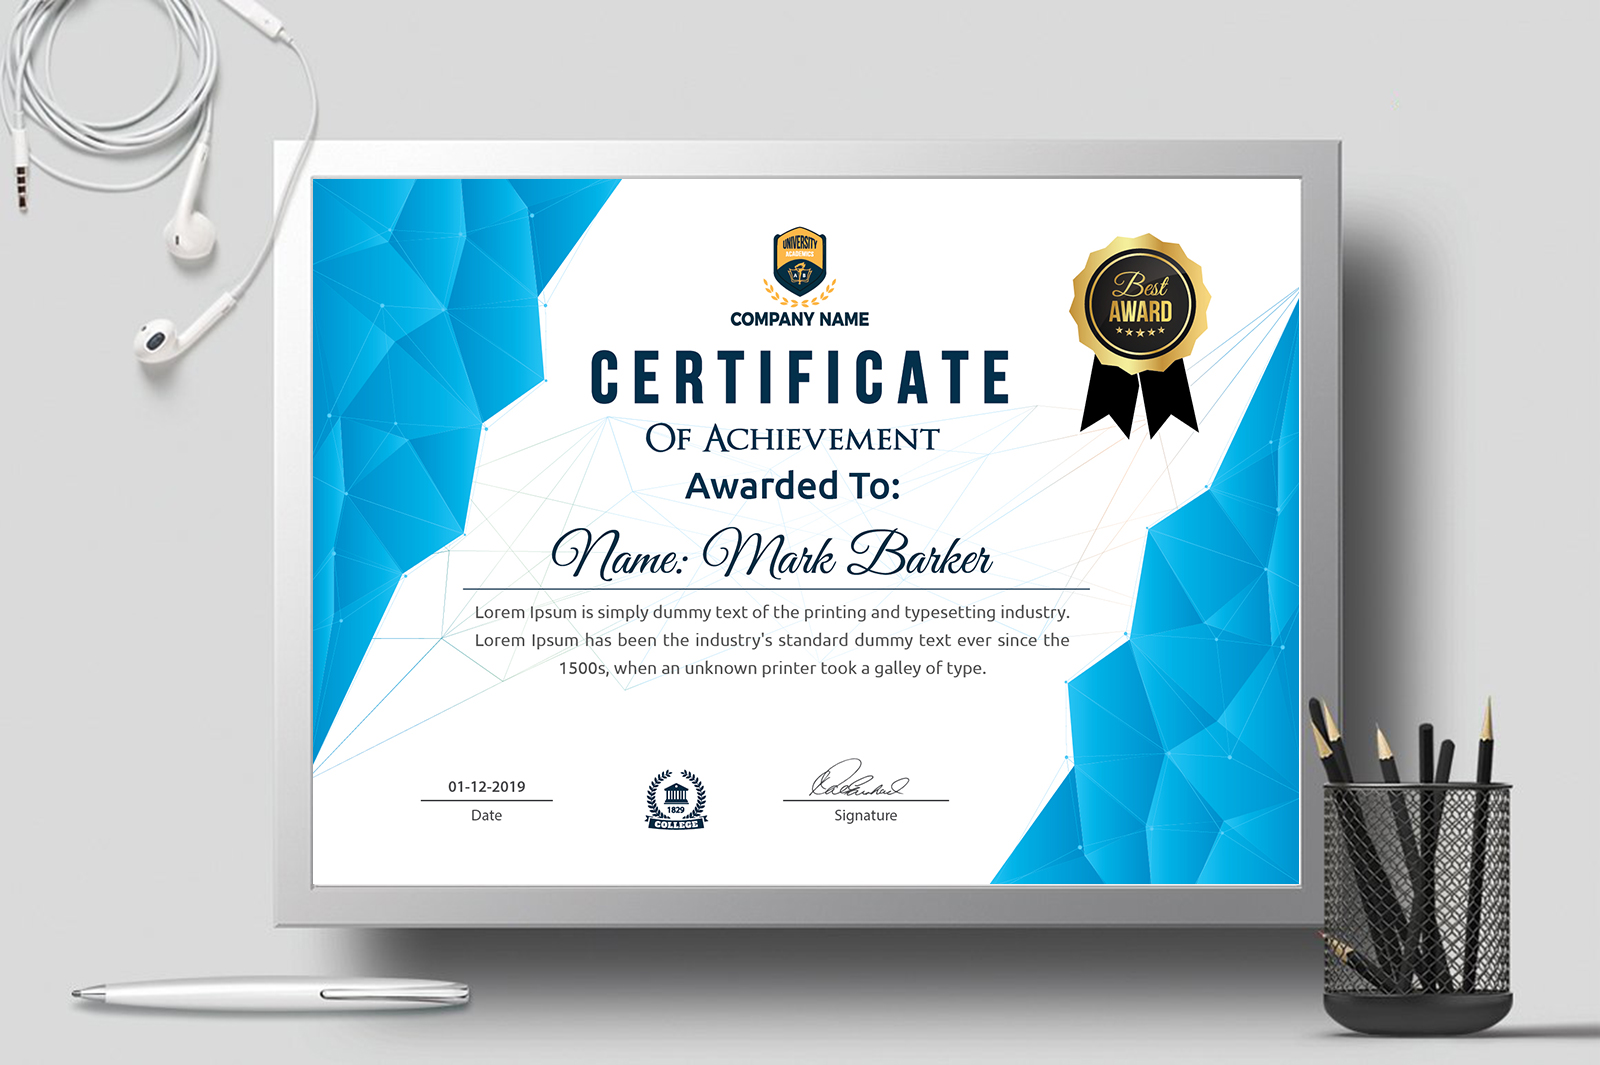 Mark Barker Creative Certificate Template